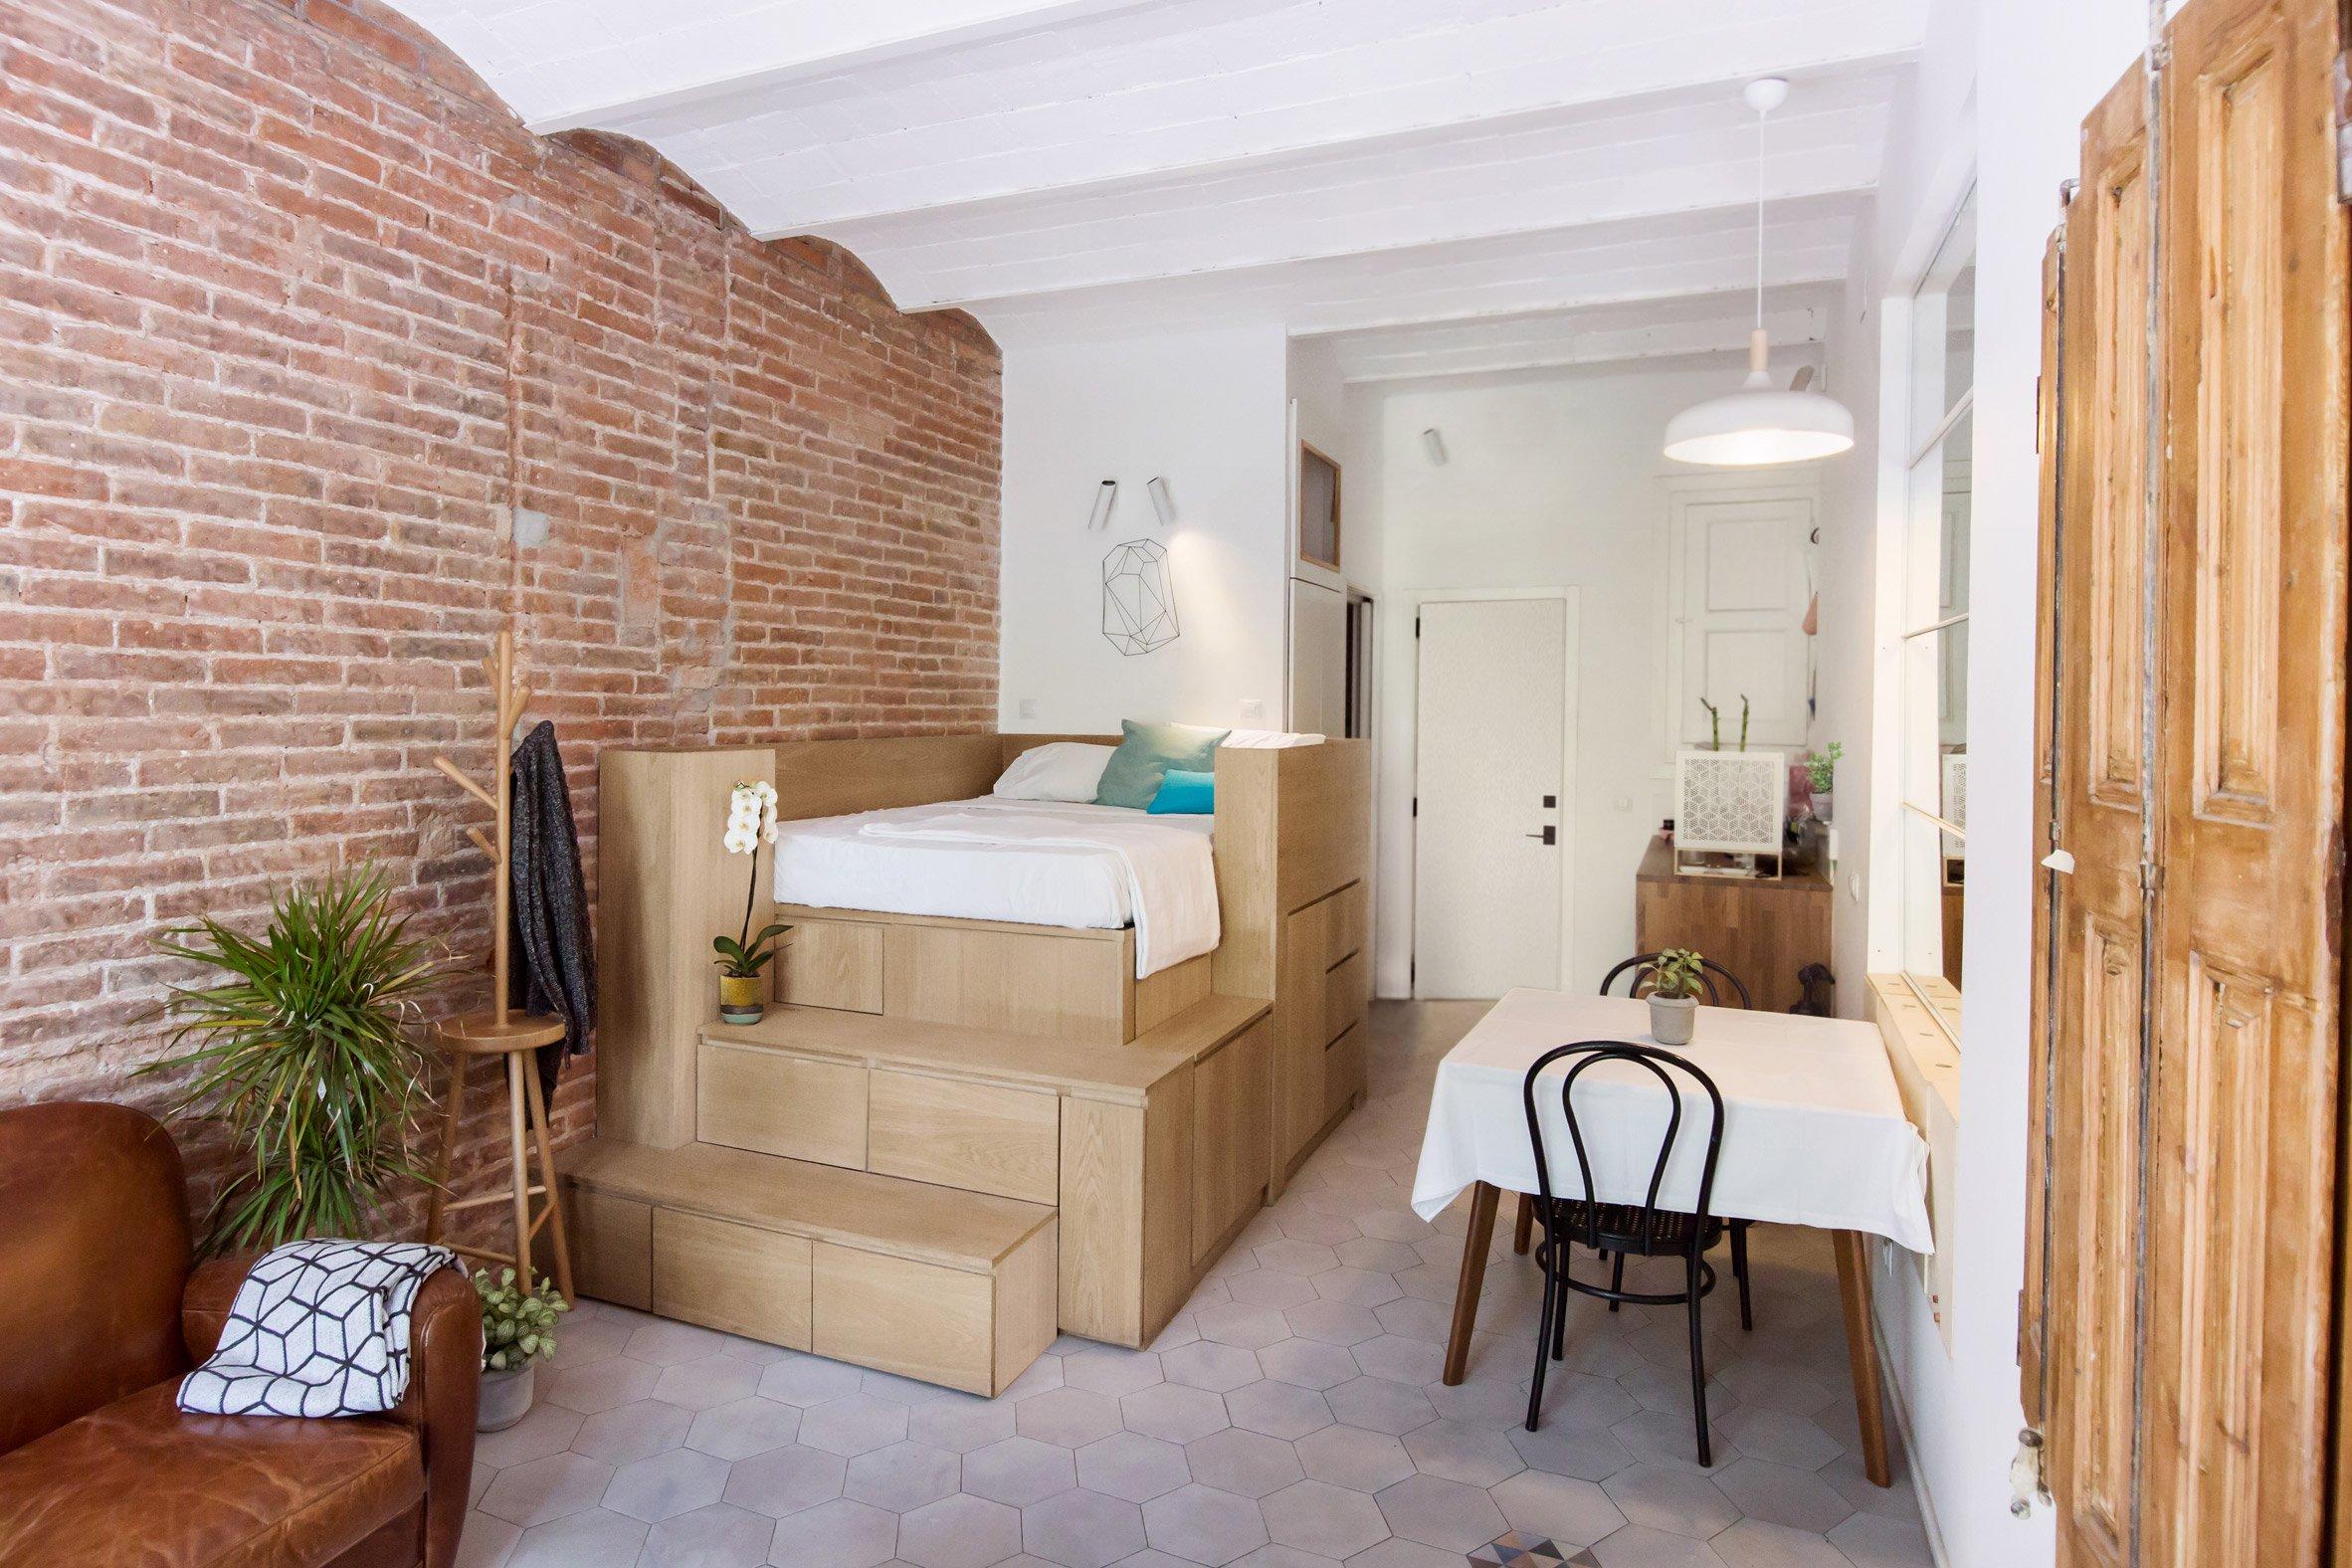 architecture-25m2-loft-interior-design-studia-osnovadesign-osnova-poltava_02